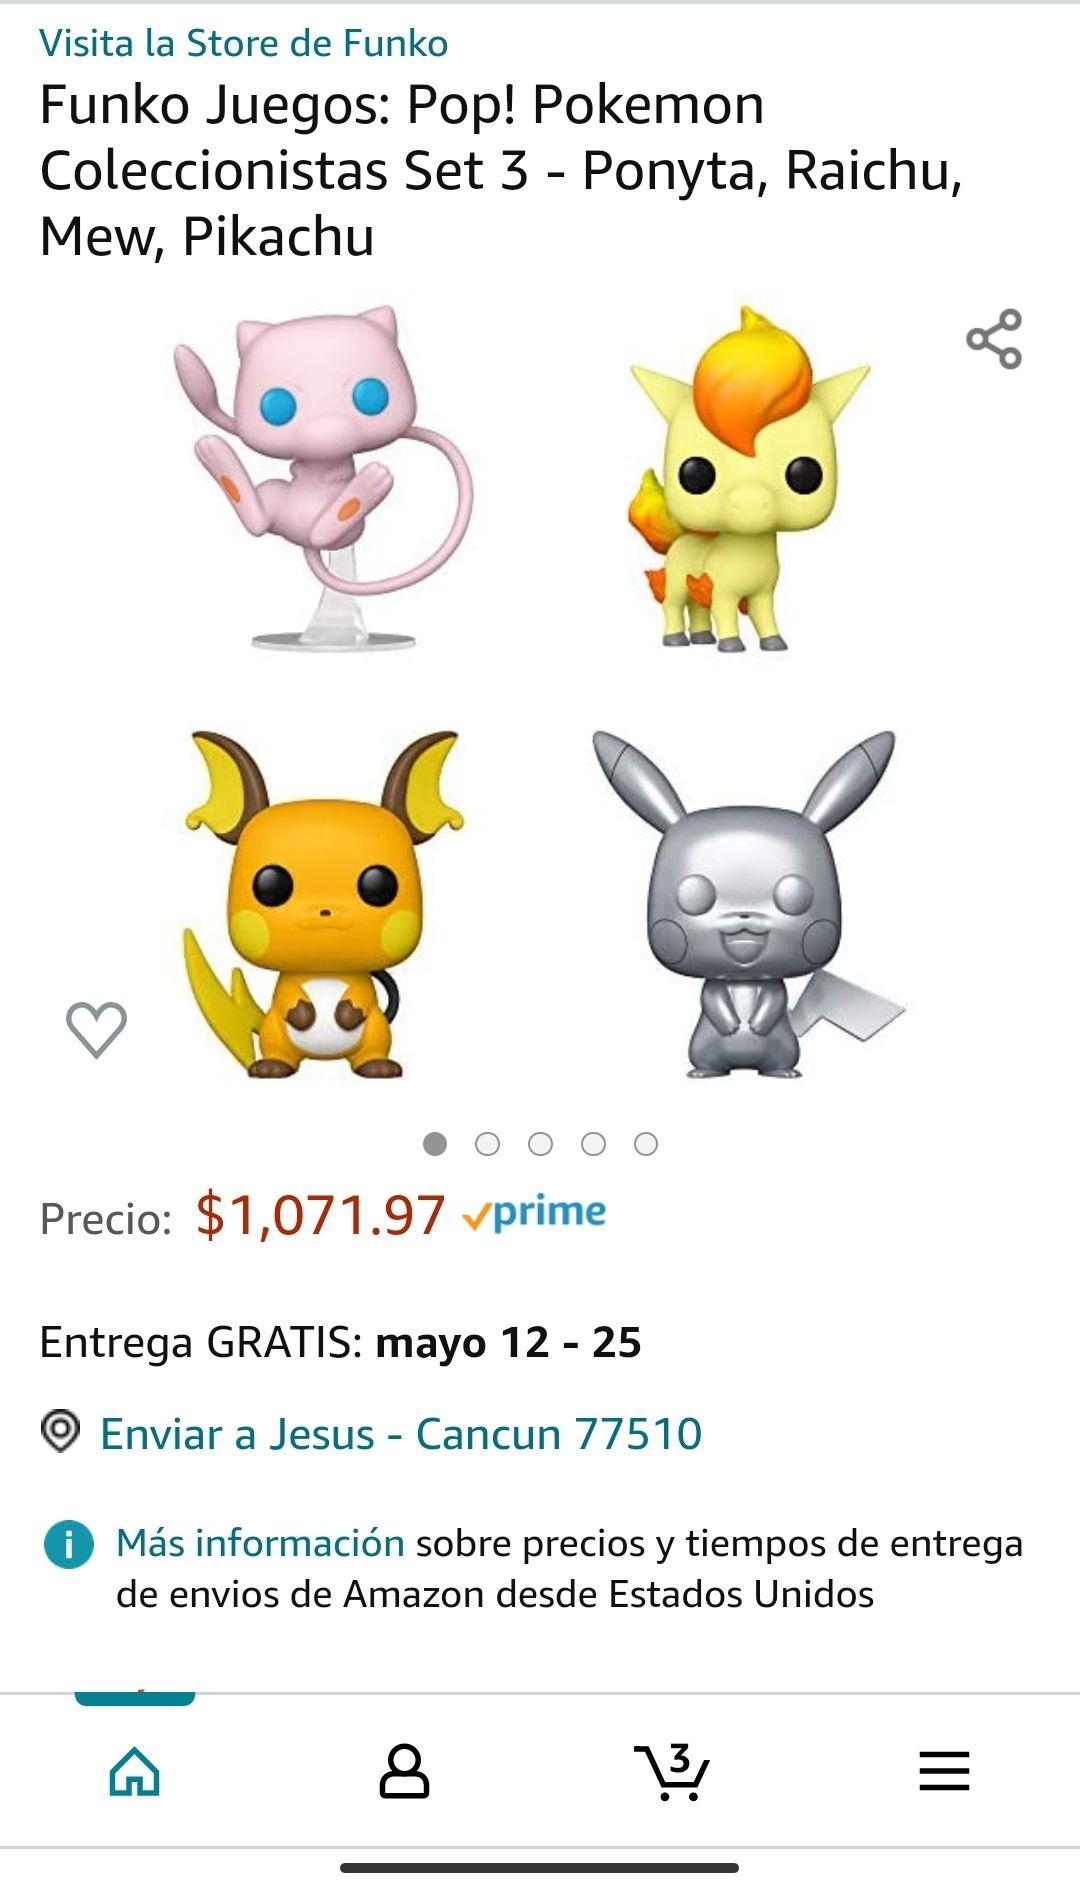 Amazon: Funko Juegos: Pop! Pokemon Coleccionistas Set 3 - Ponyta, Raichu, Mew, Pikachu